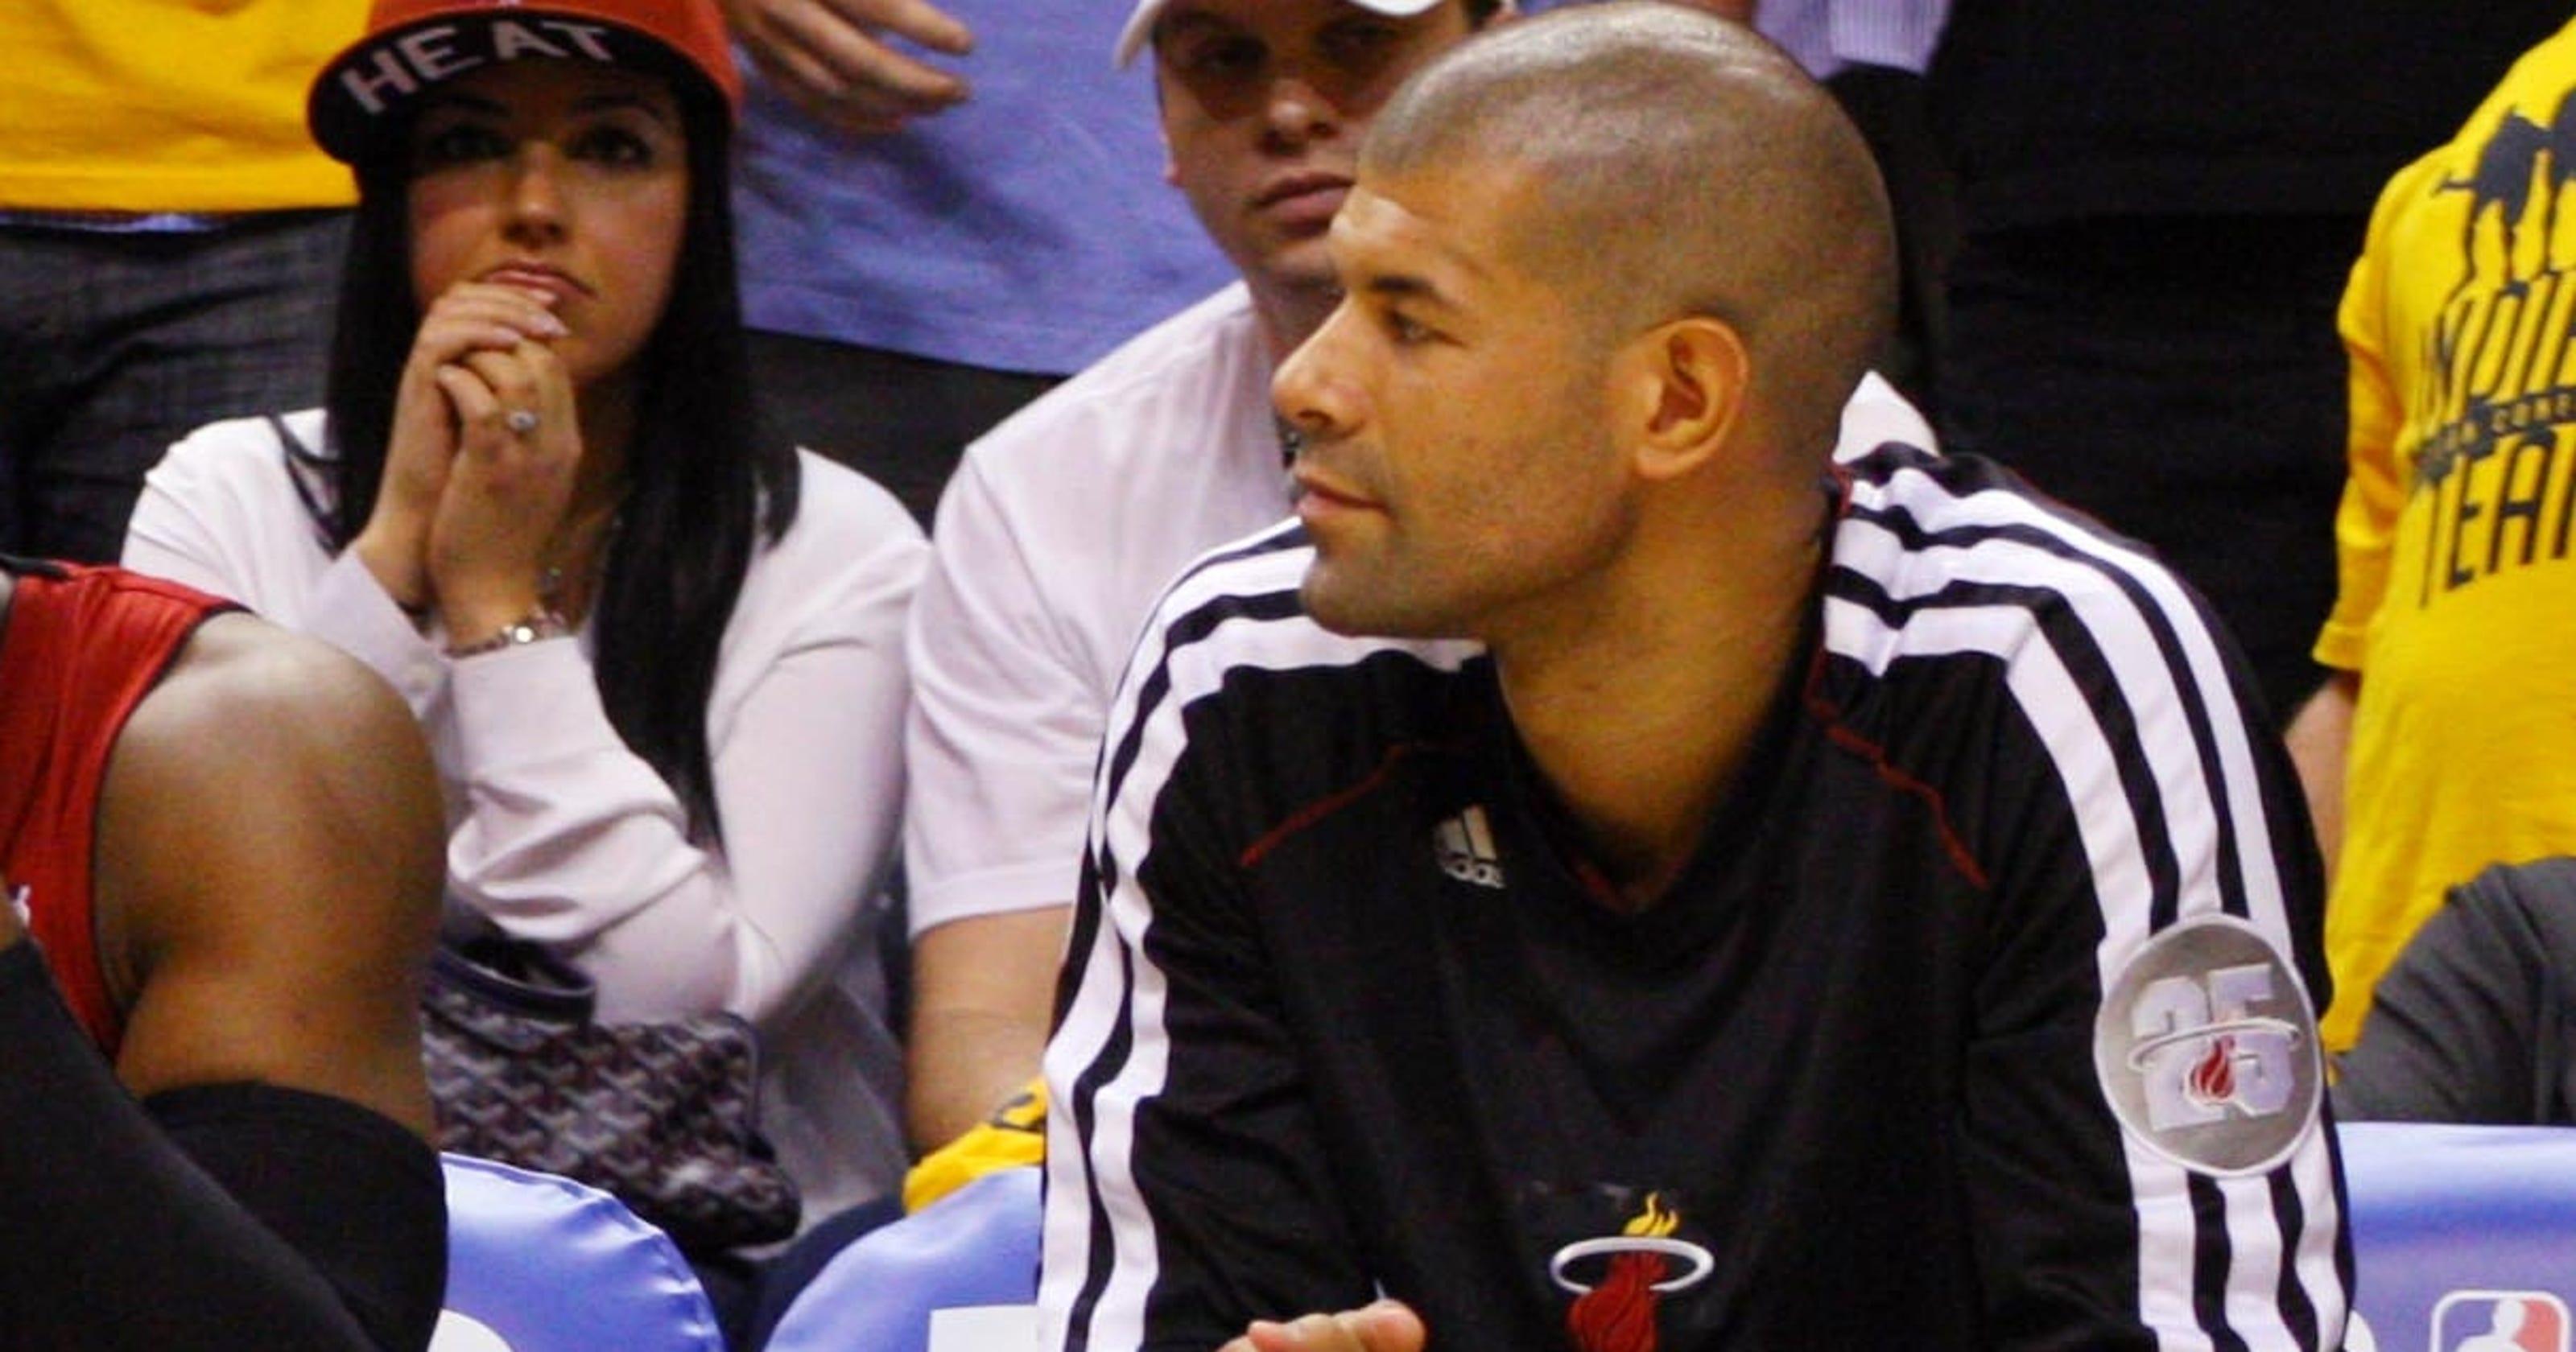 Miami Heat's Shane Battier addresses DNP his own way